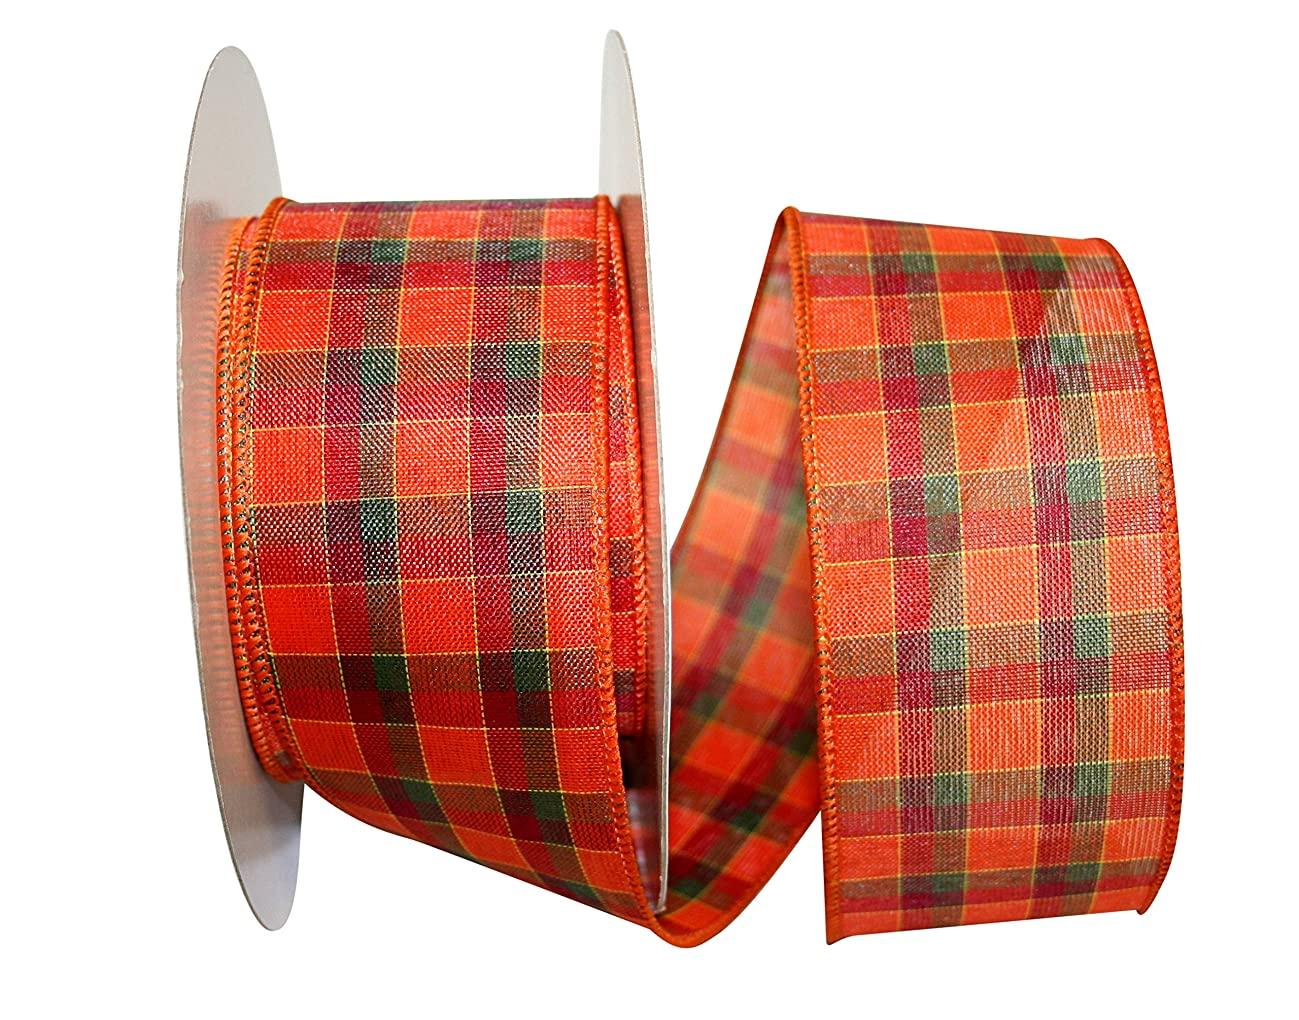 Reliant Ribbon 92298W-001-40K Alford Plaid 3 Value Wired Edge Ribbon, 2-1/2 Inch X 50 Yards, Multi